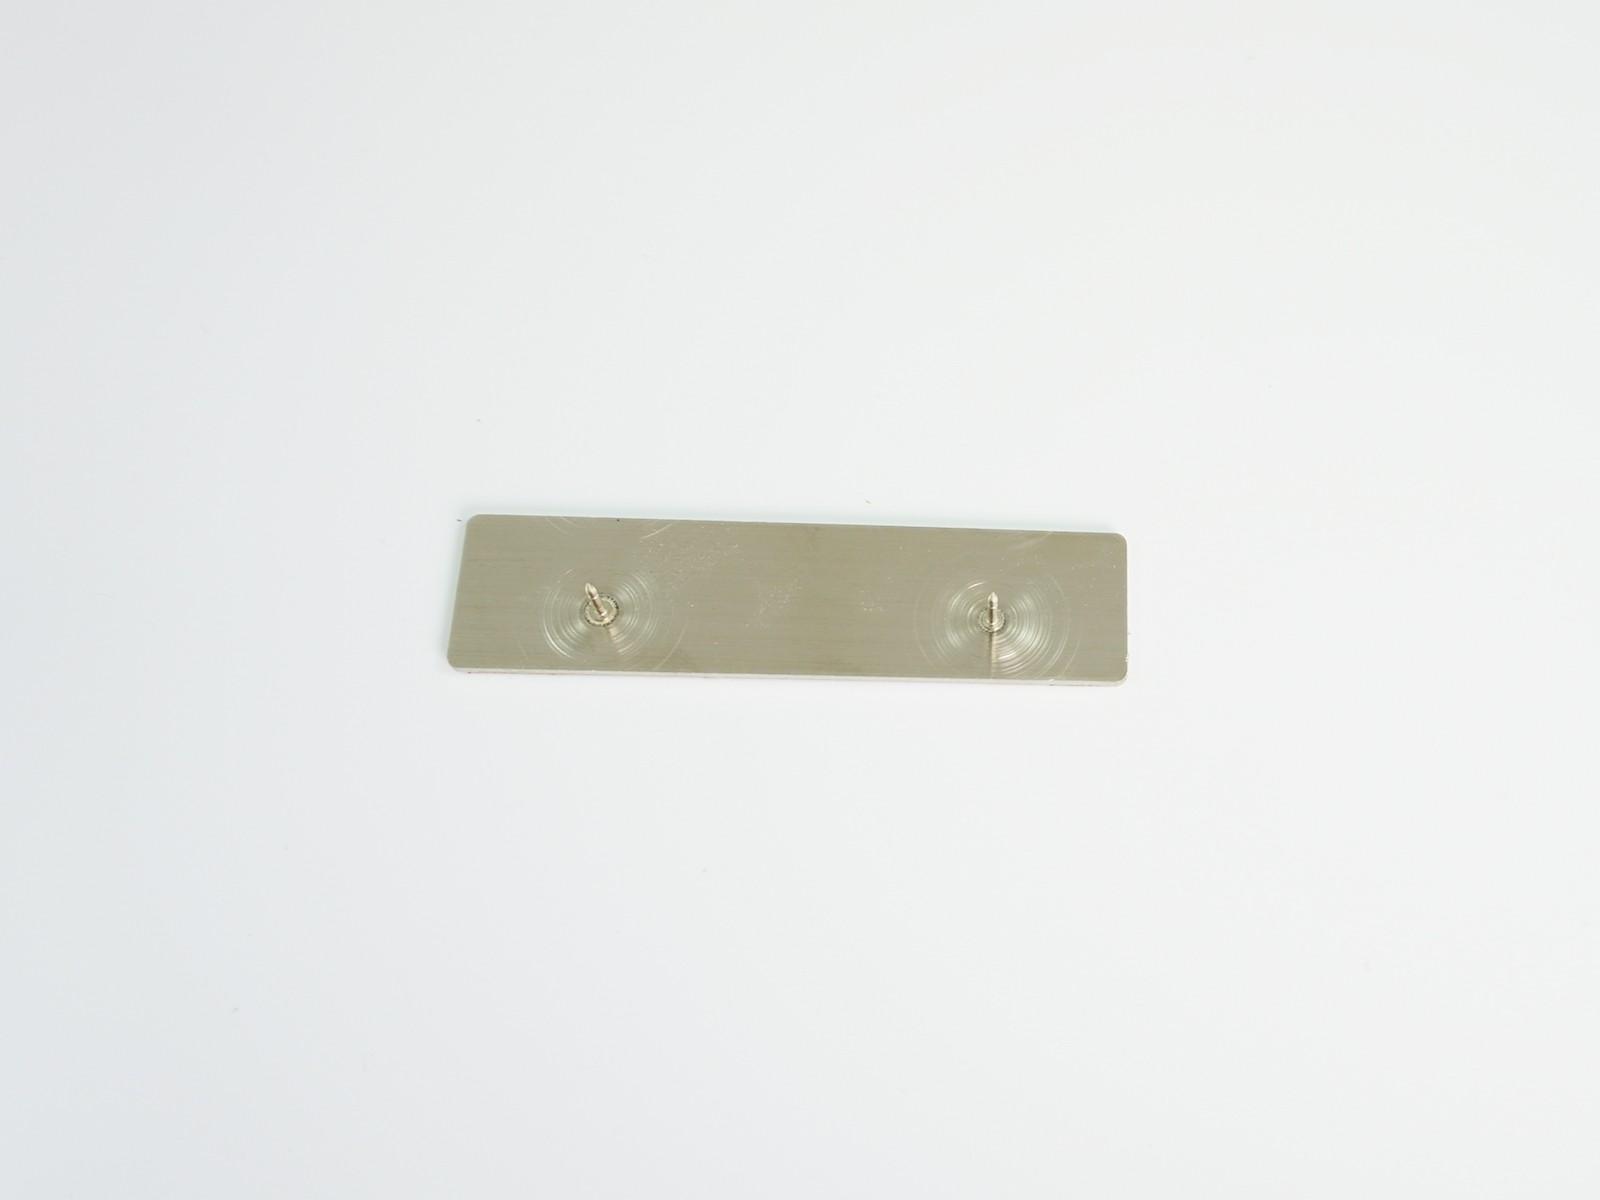 "3/4"" x 3"" Satin Silver Badge Clutch Back"